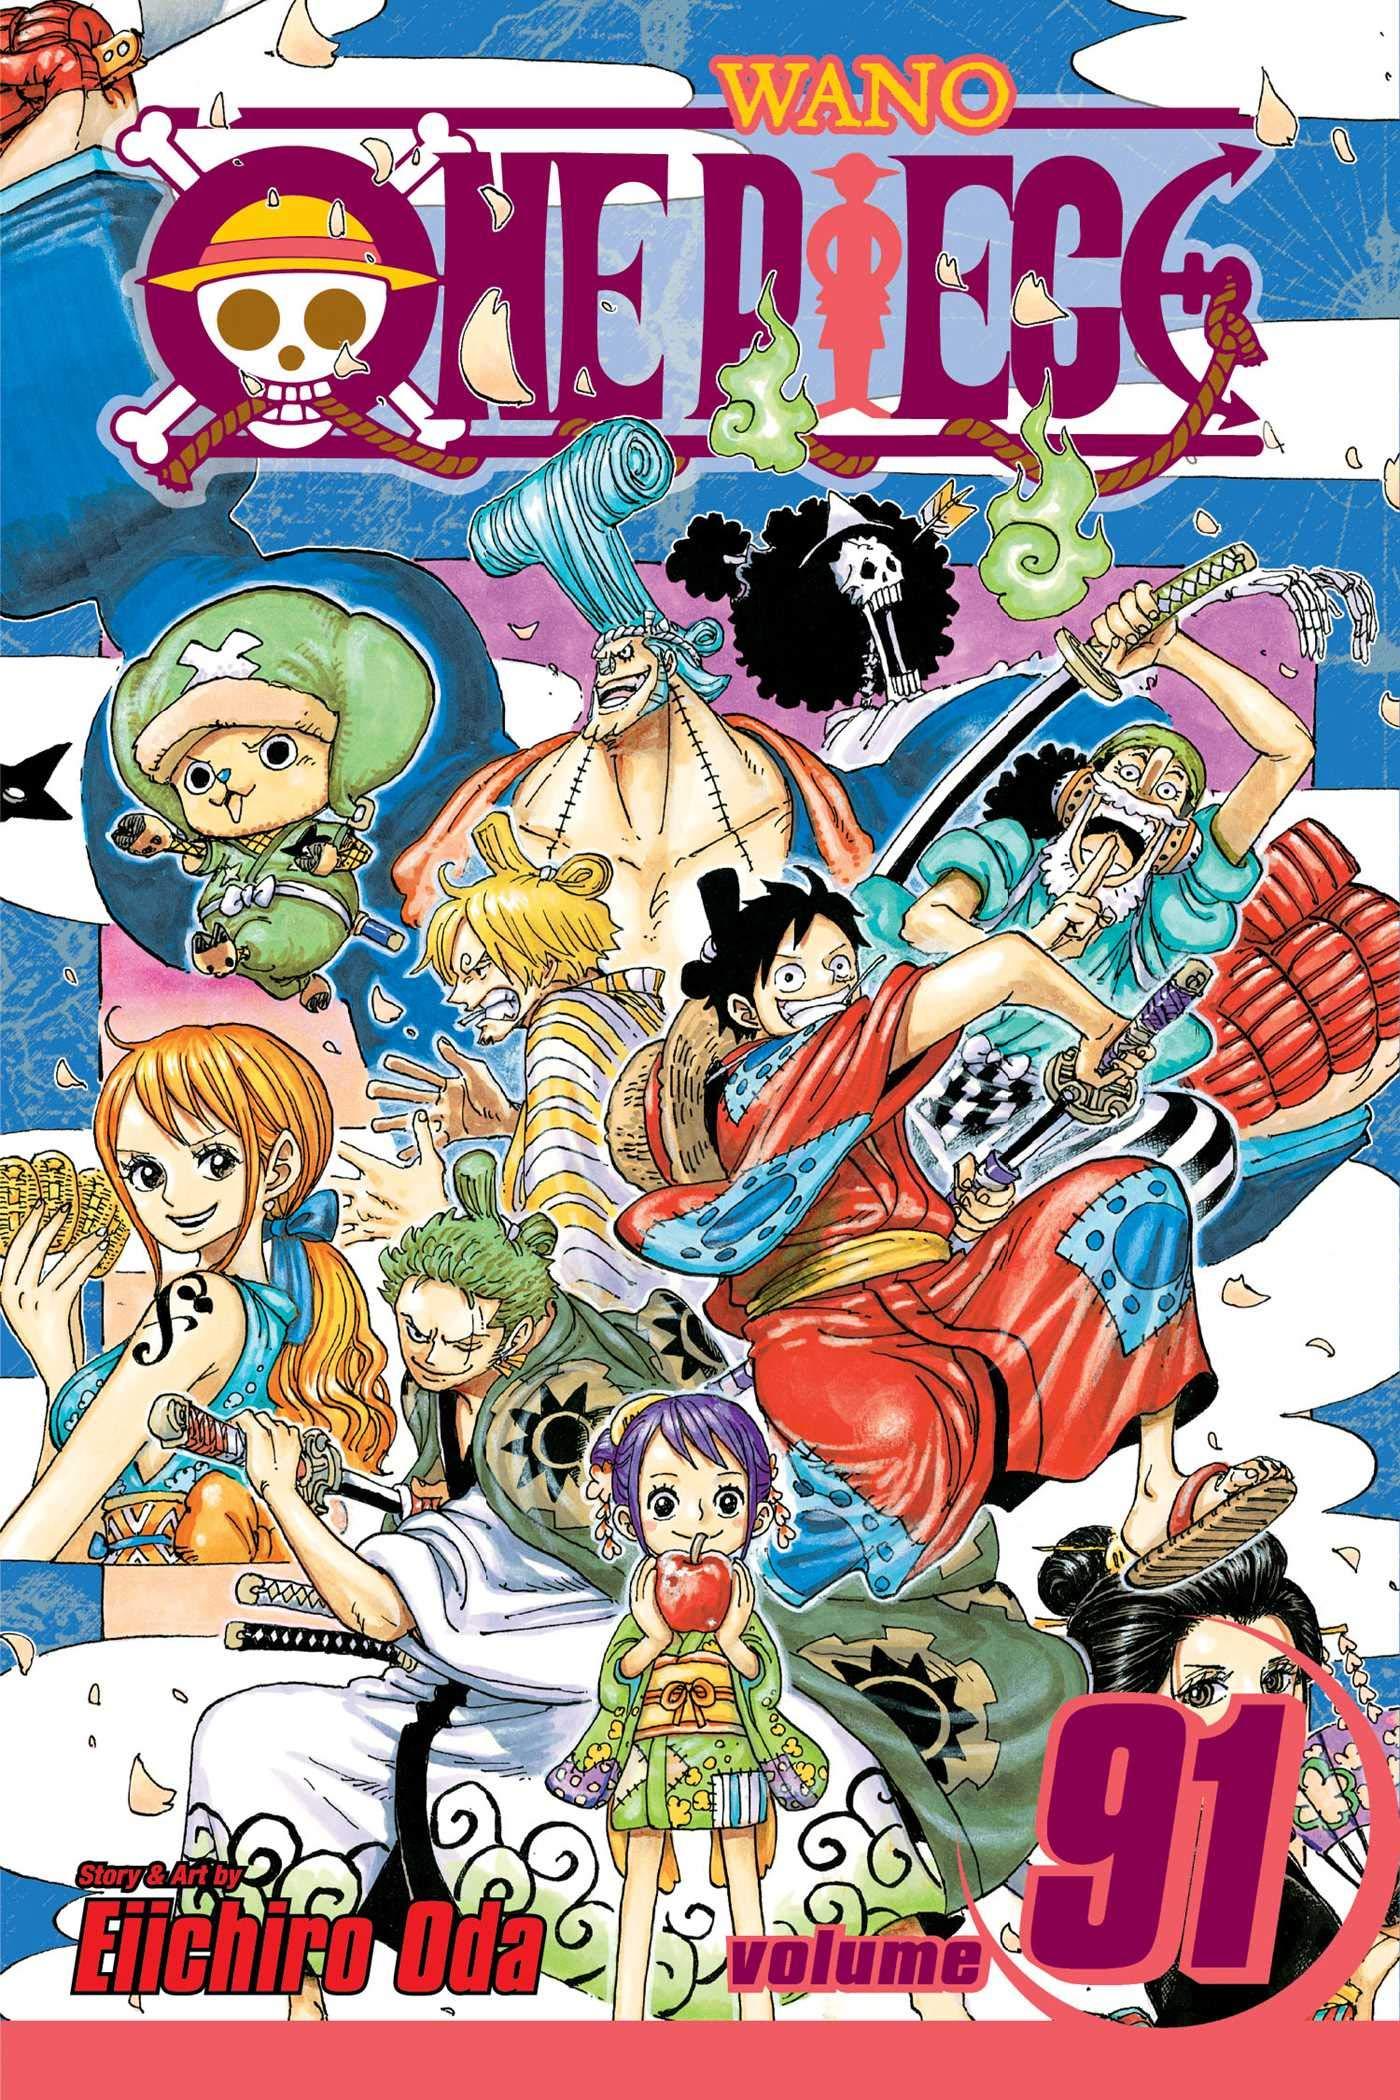 One Piece Vol 91 Adventure In The Land Of Samurai Amazon De Oda Eiichiro Oda Eiichiro Fremdsprachige Bucher